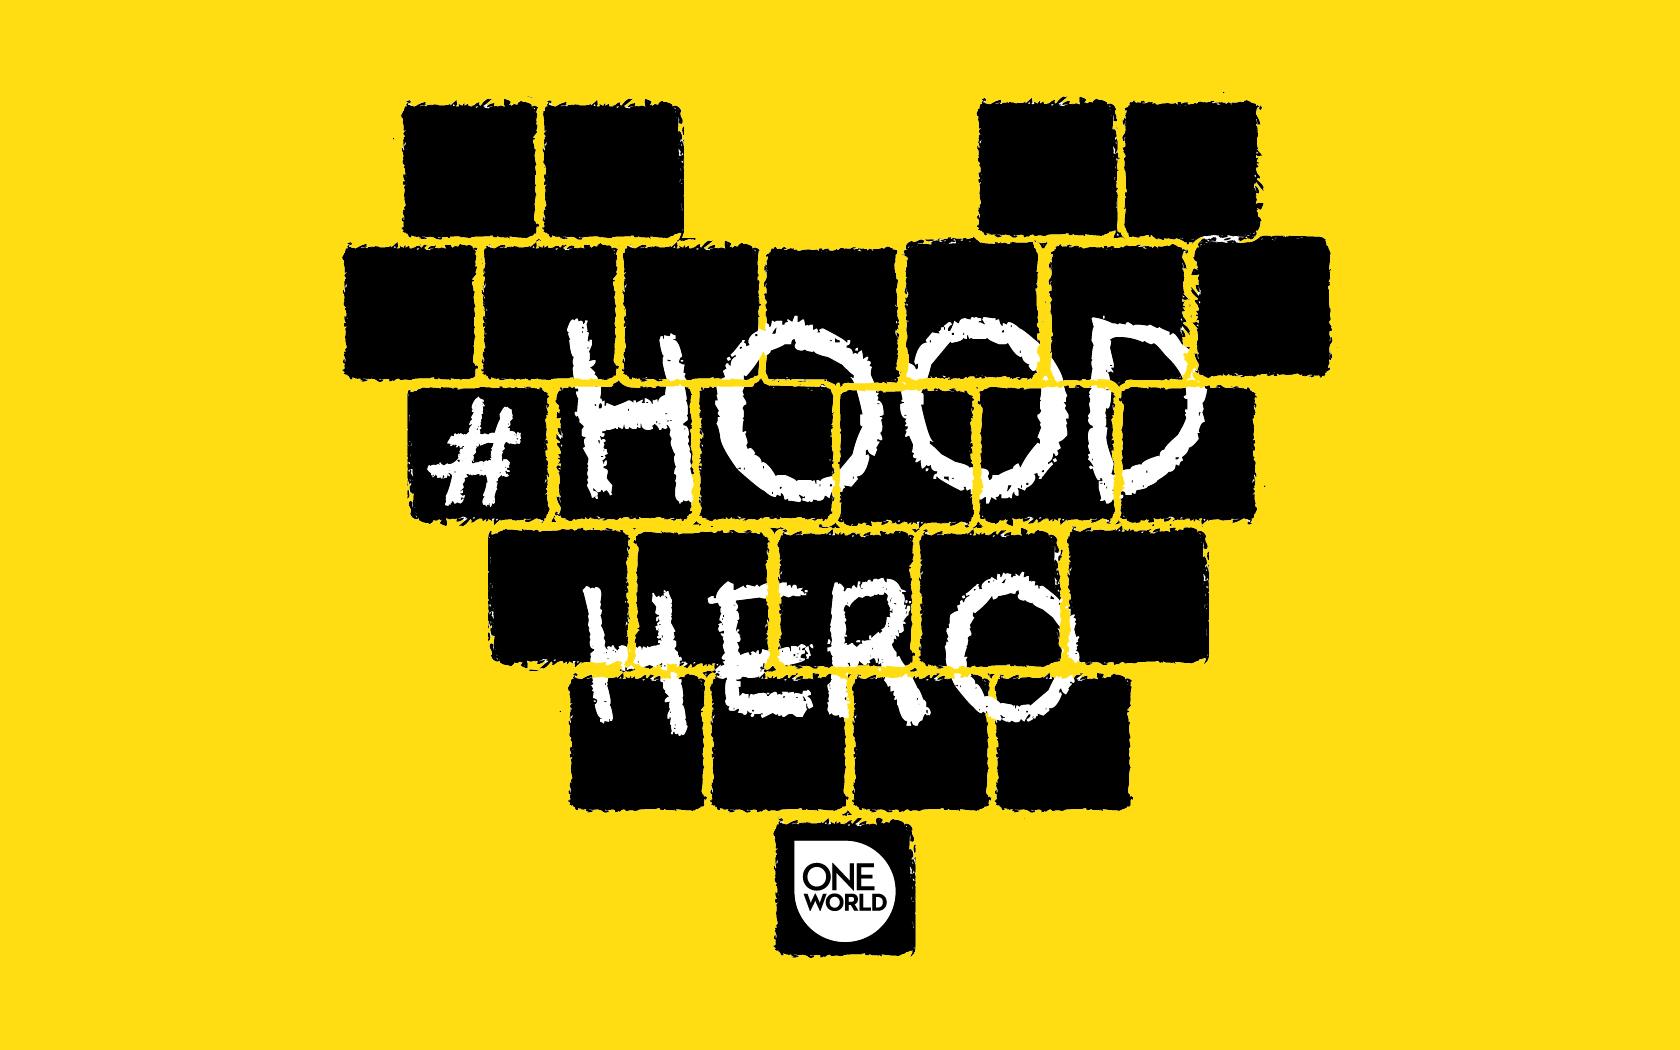 Hoodhero